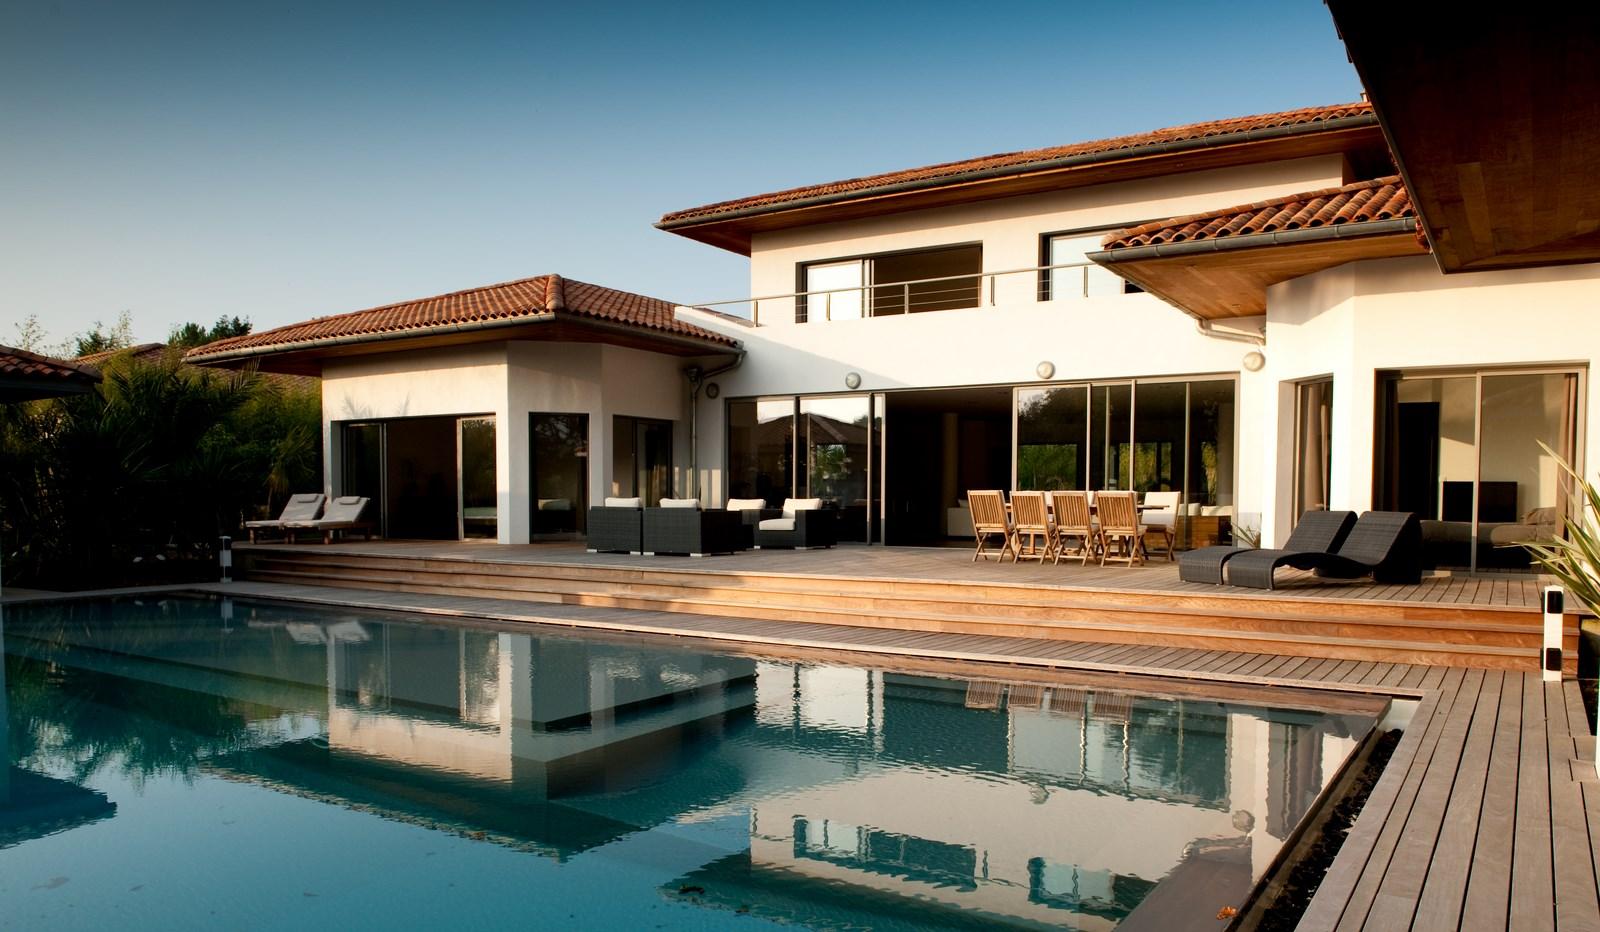 Comment acheter maison comment acheter maison with for Acheter une maison a nice